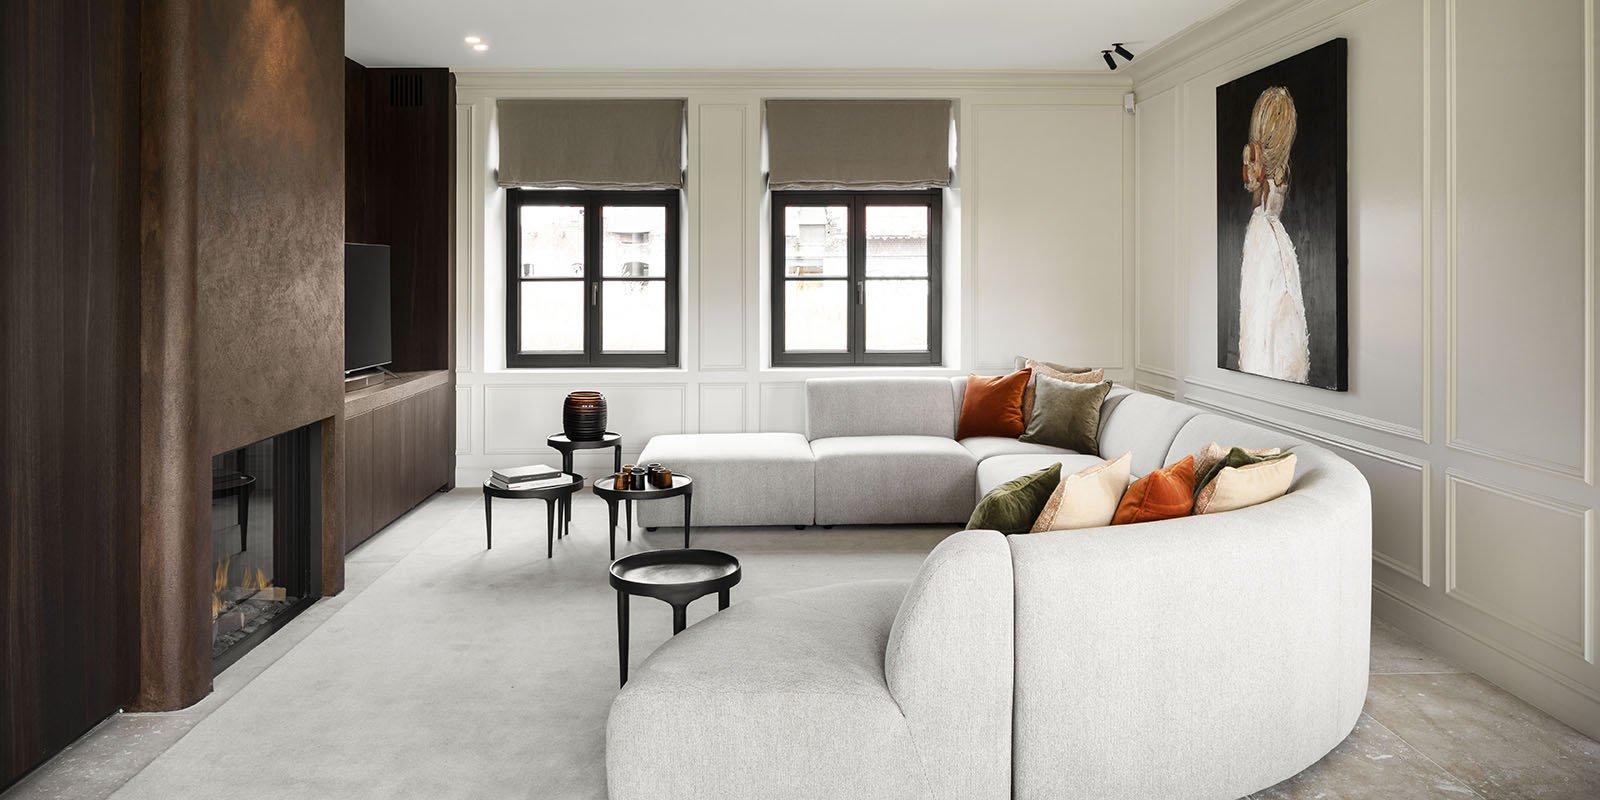 Warm modern interieur, warm modern interieur, Sur Mesure Interieur